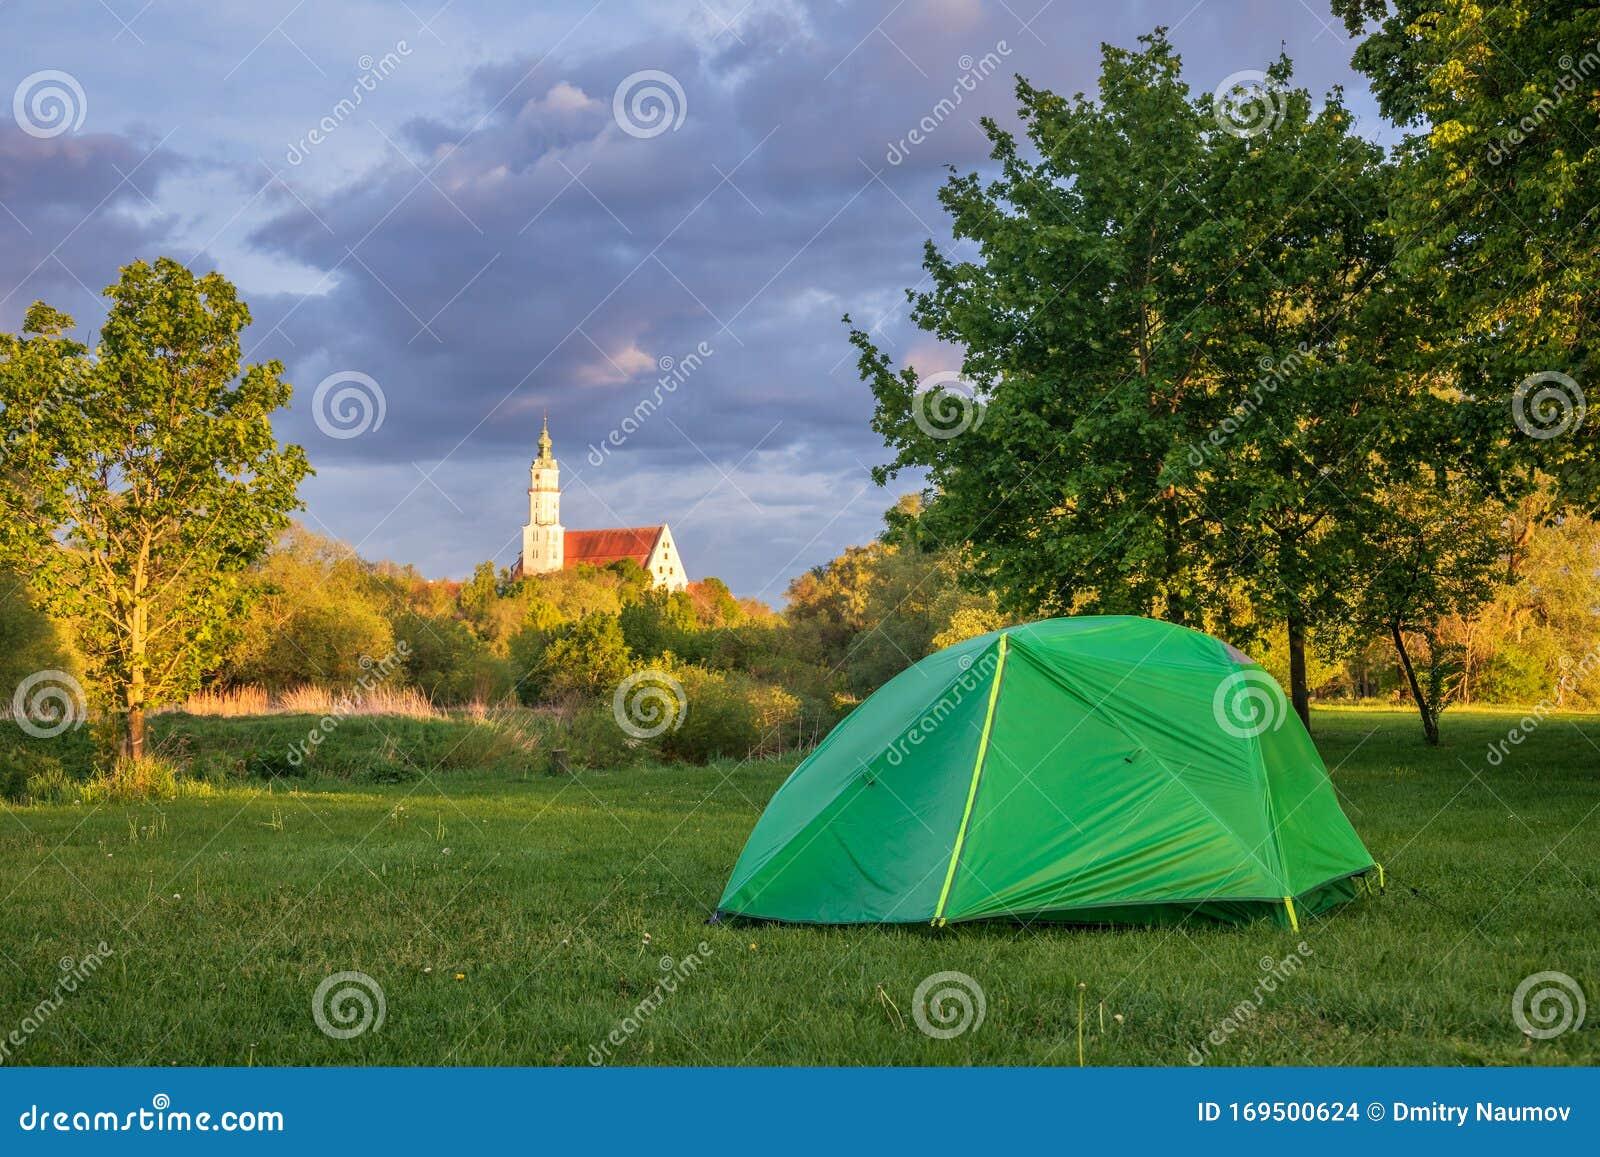 Camping Tent Romantic Road Touristic Route Donauworth ...